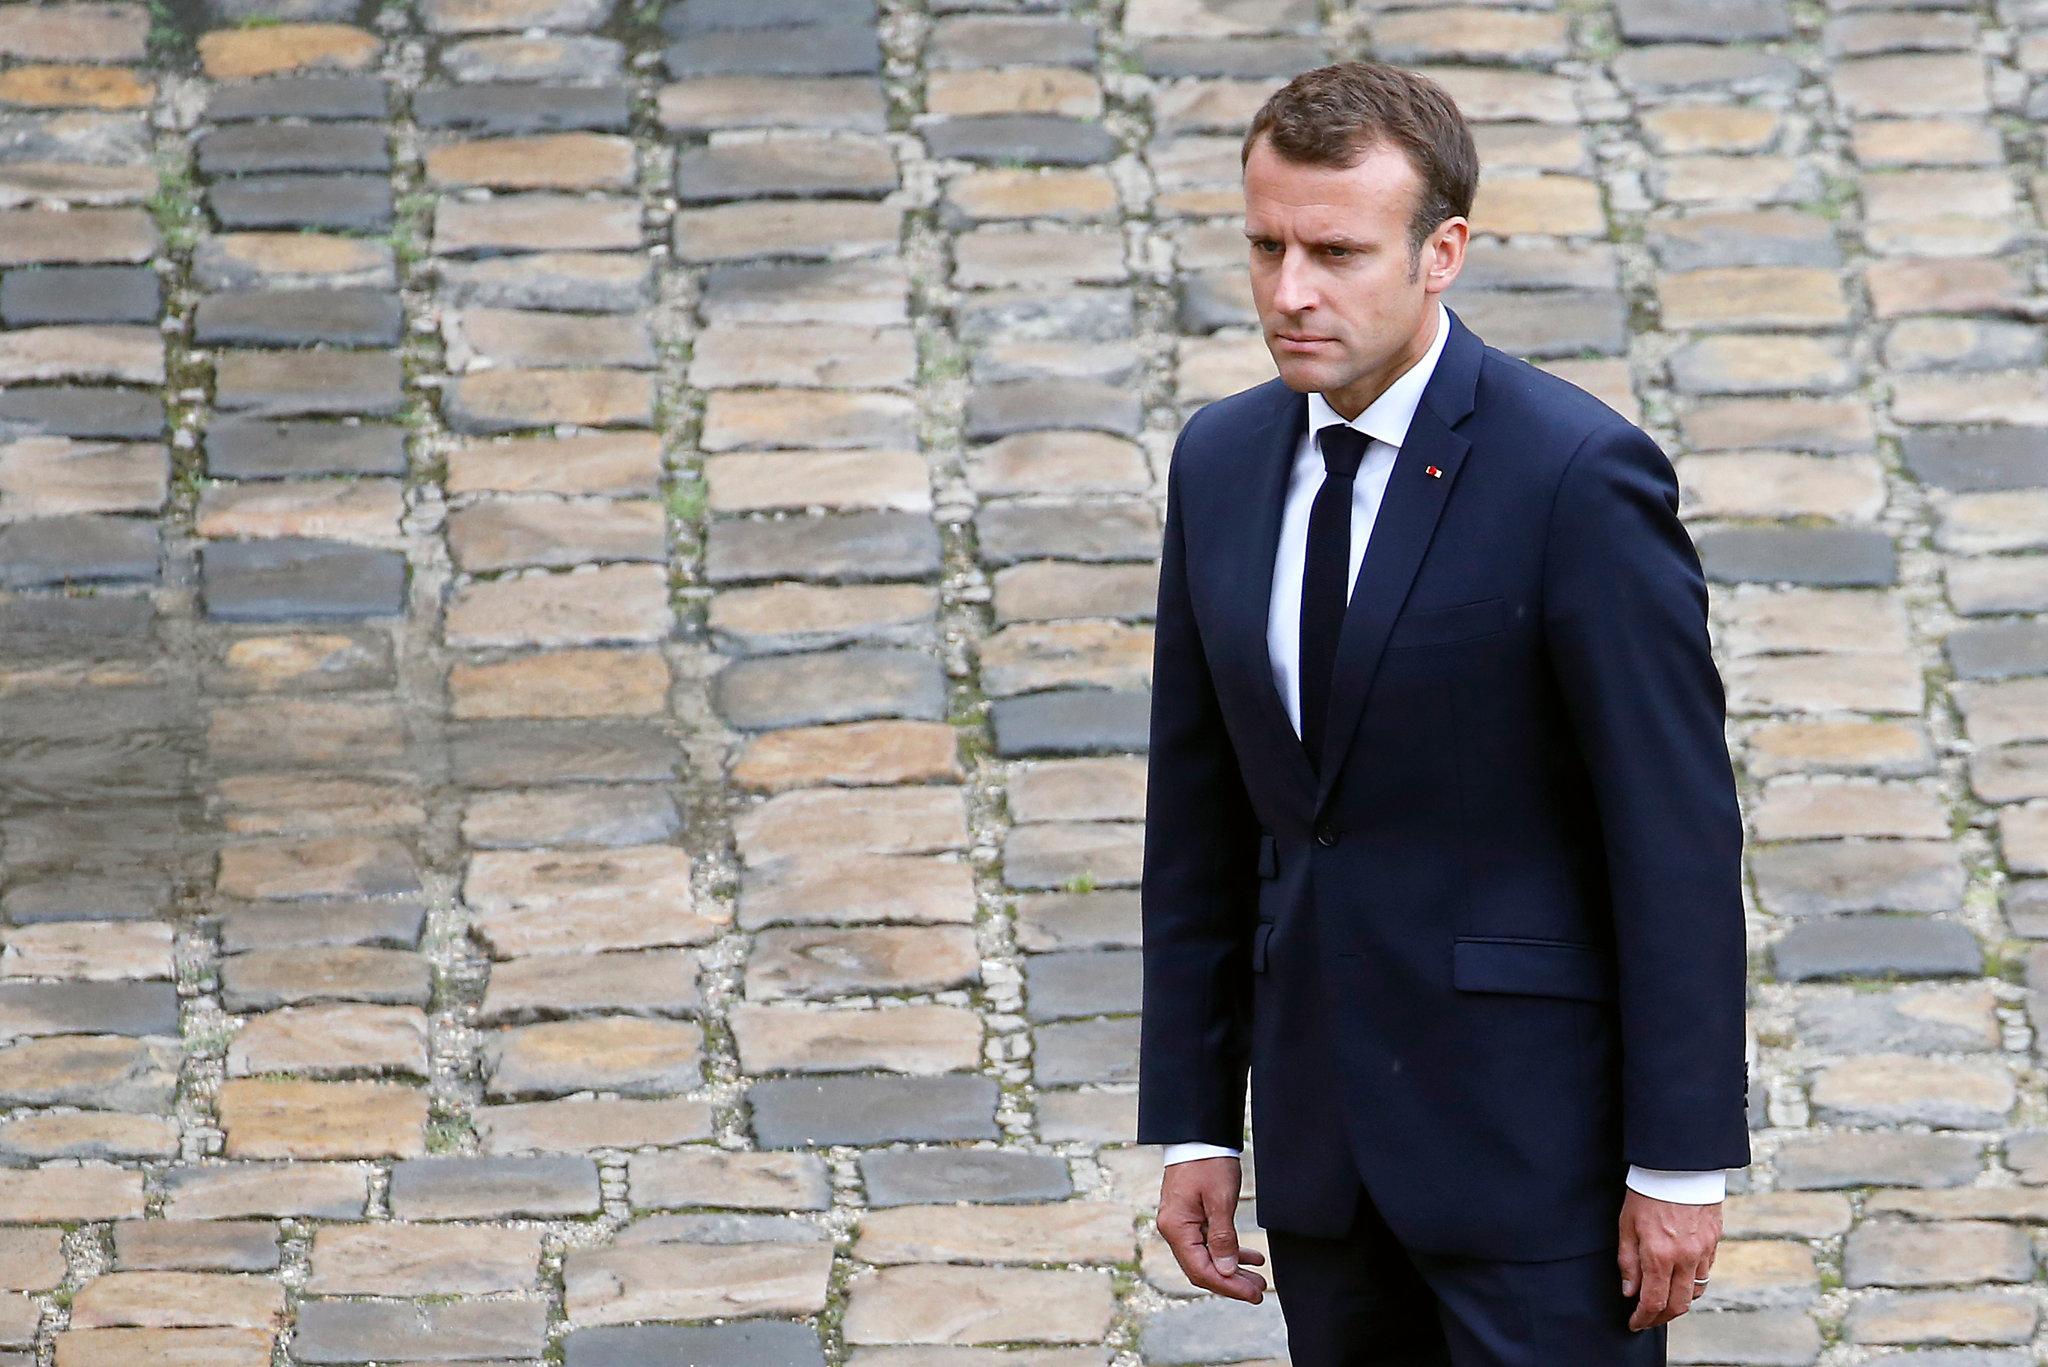 French President Emmanuel Macron Or Financial Times. British